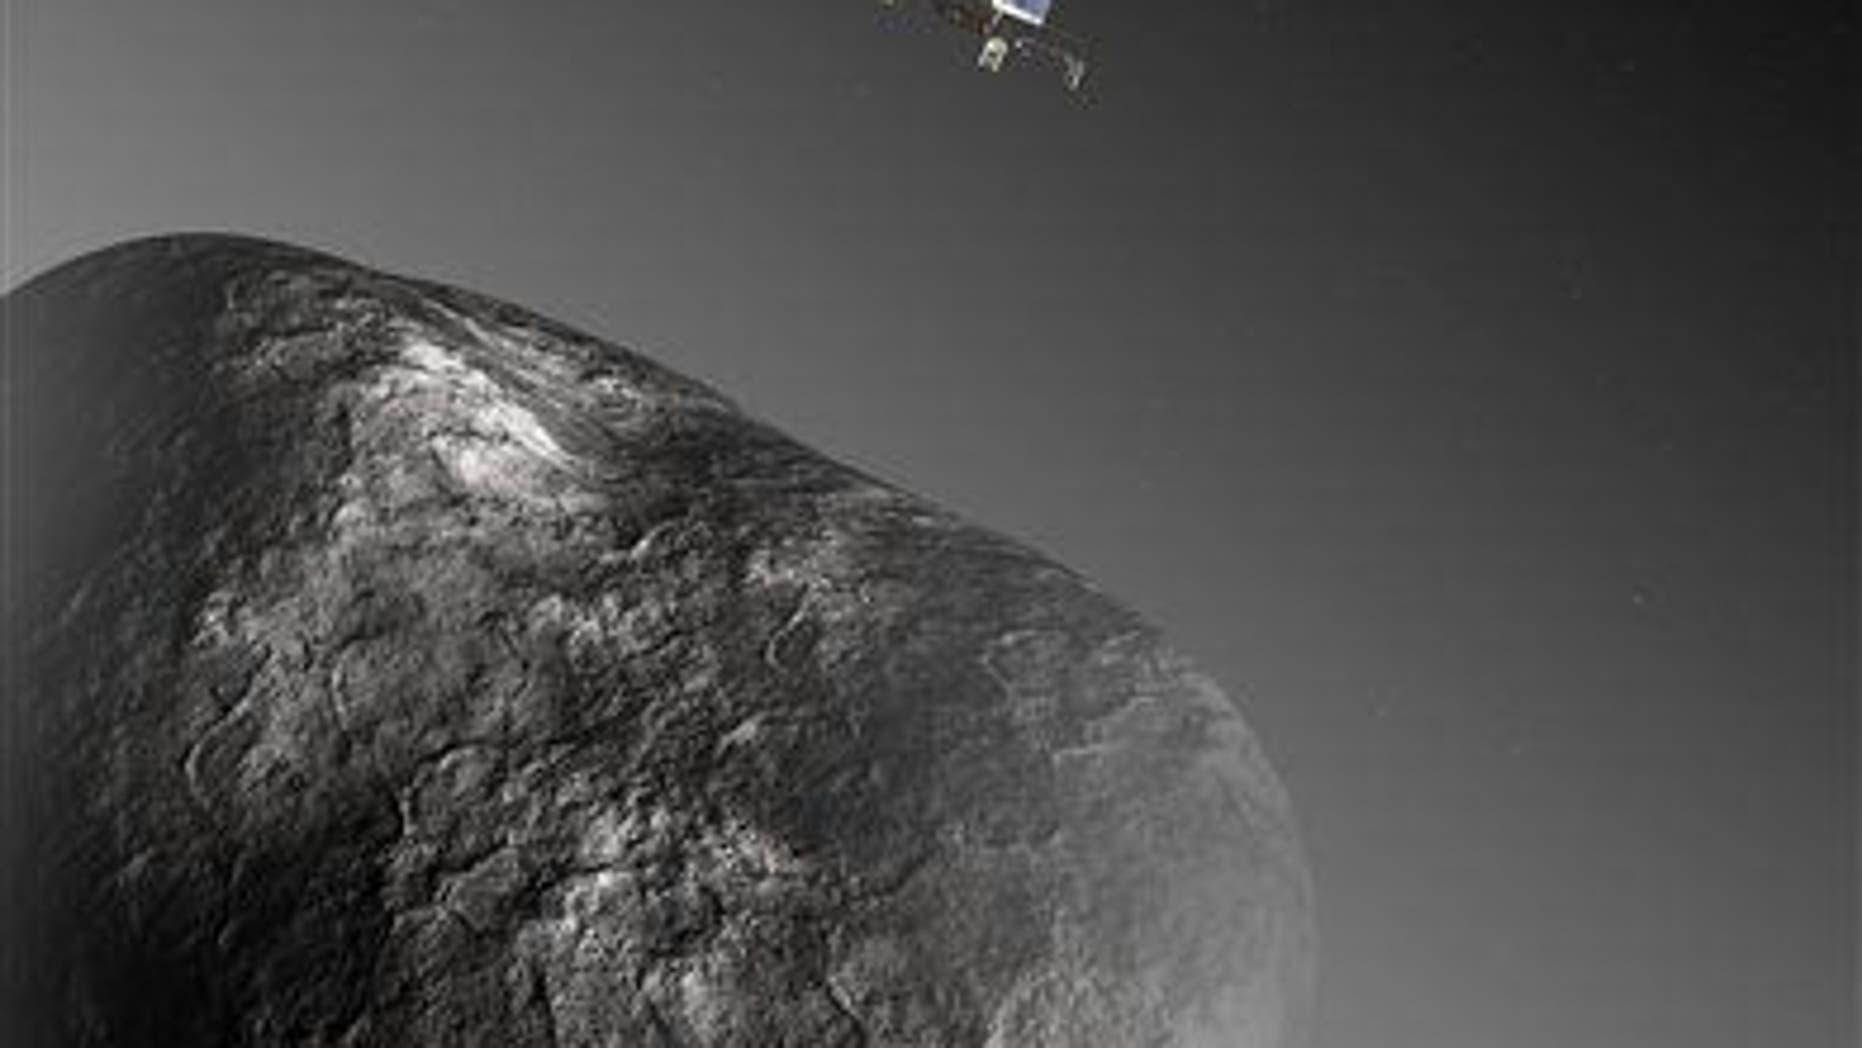 An artist's impression of the Rosetta orbiter deploying the Philae lander to comet 67P/Churyumov–Gerasimenko.